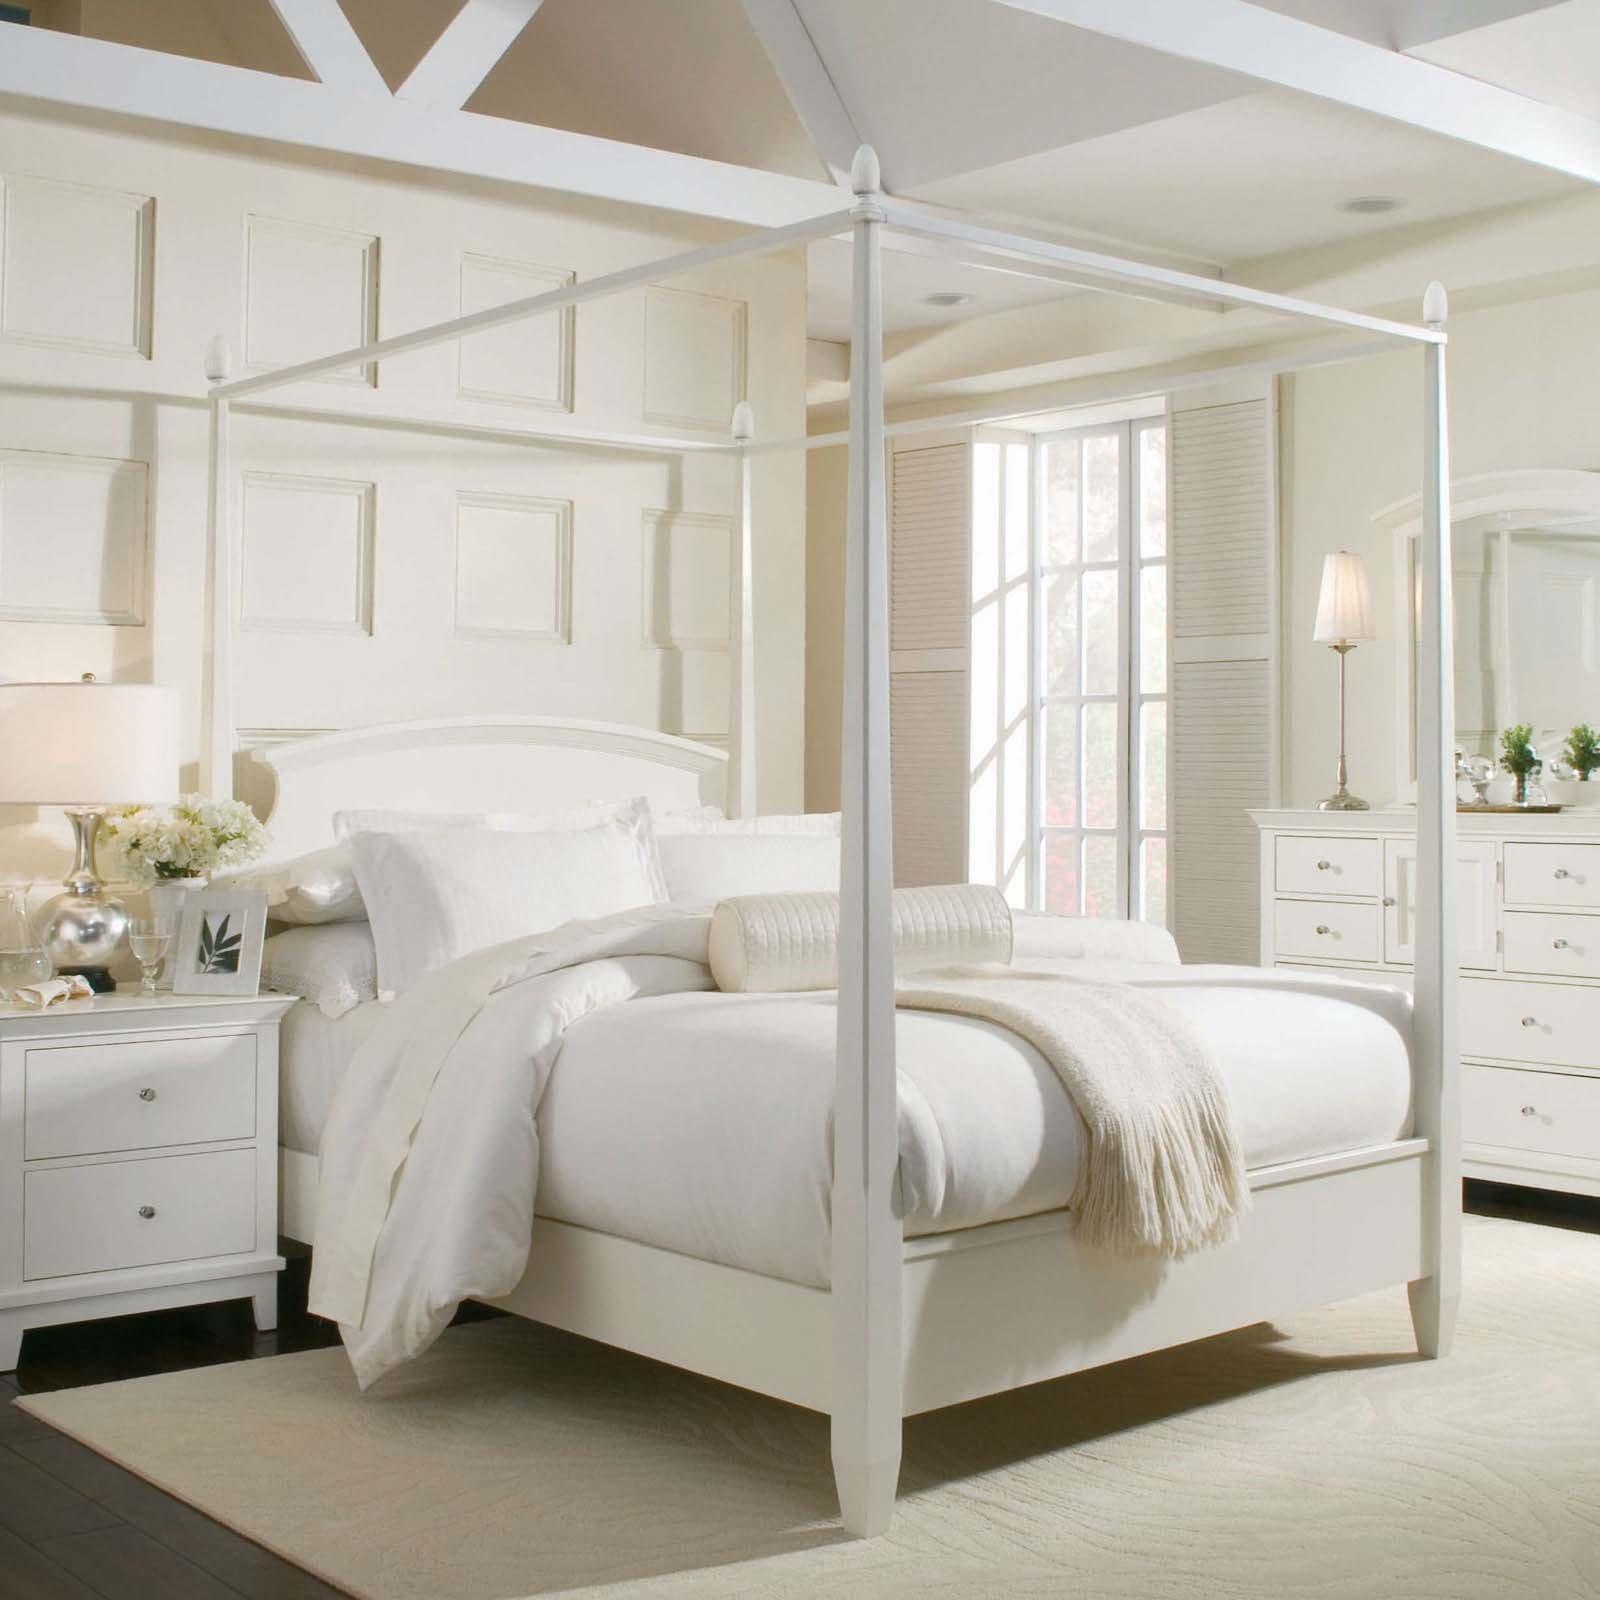 Interior Design Home Decor Furniture Furnishings The Home Look